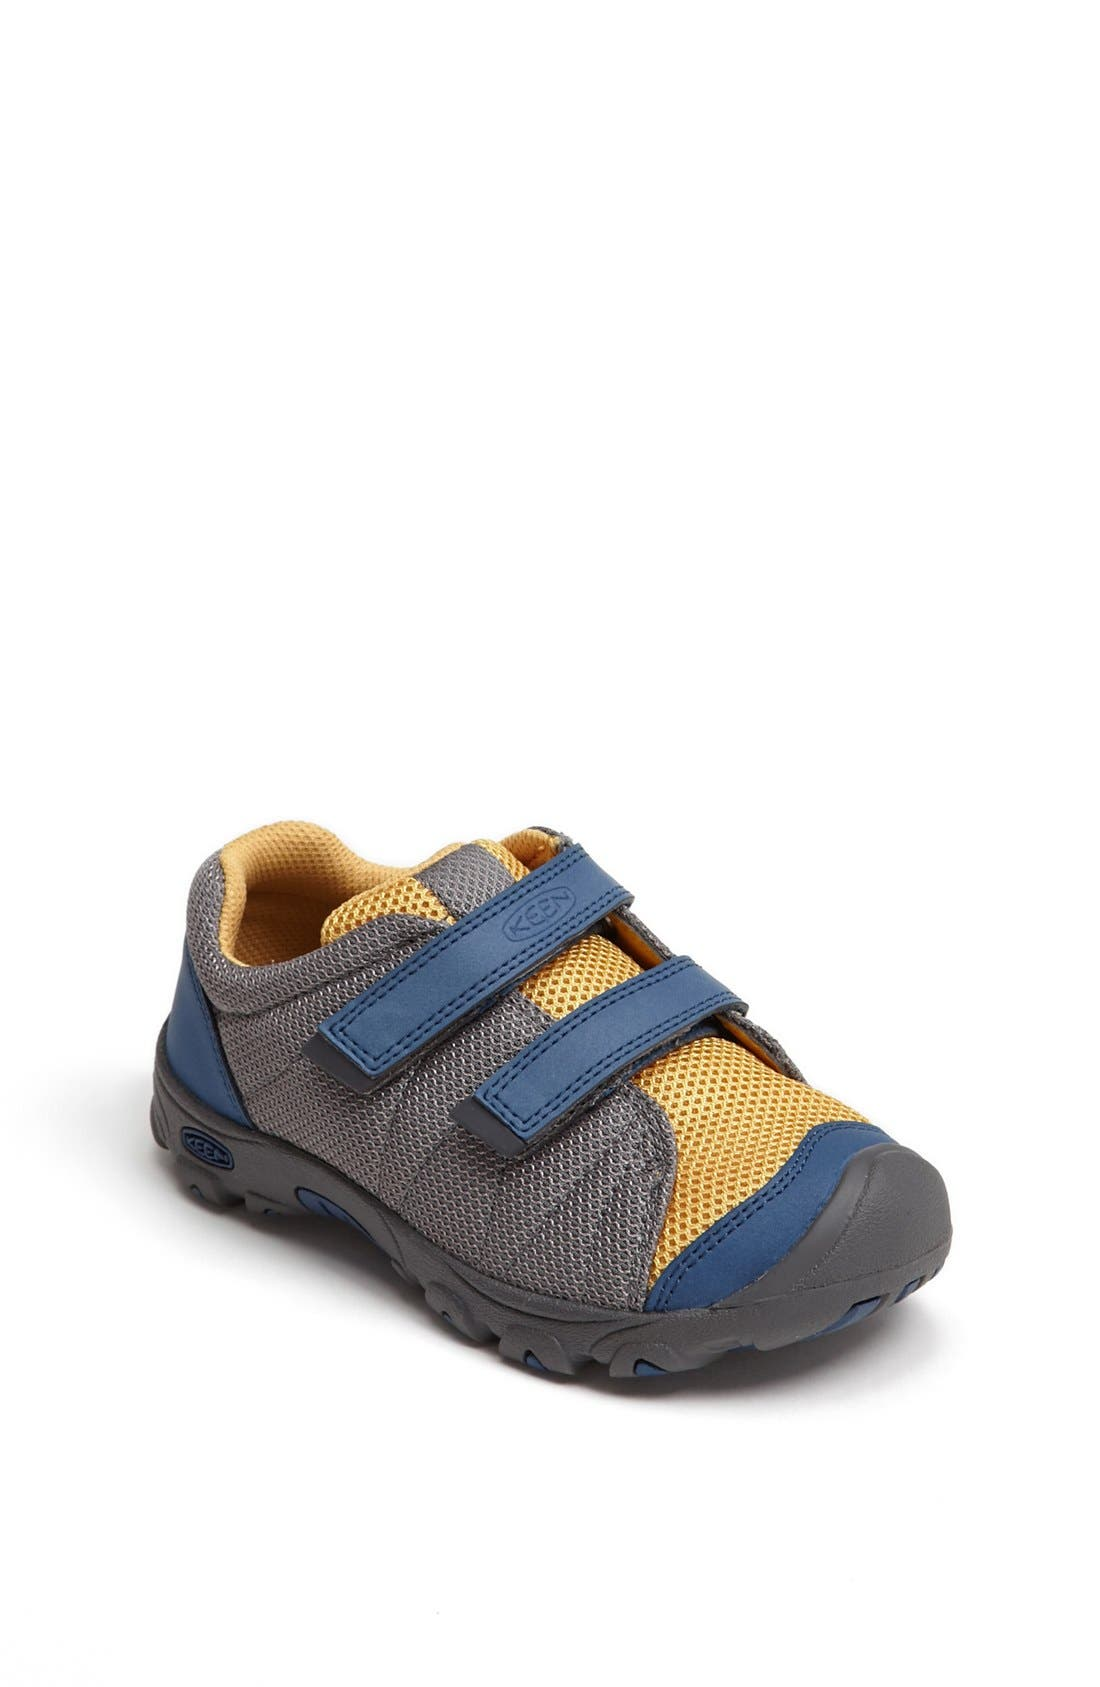 Alternate Image 1 Selected - Keen 'Riggins' Sneaker (Baby, Walker, Toddler & Little Kid)